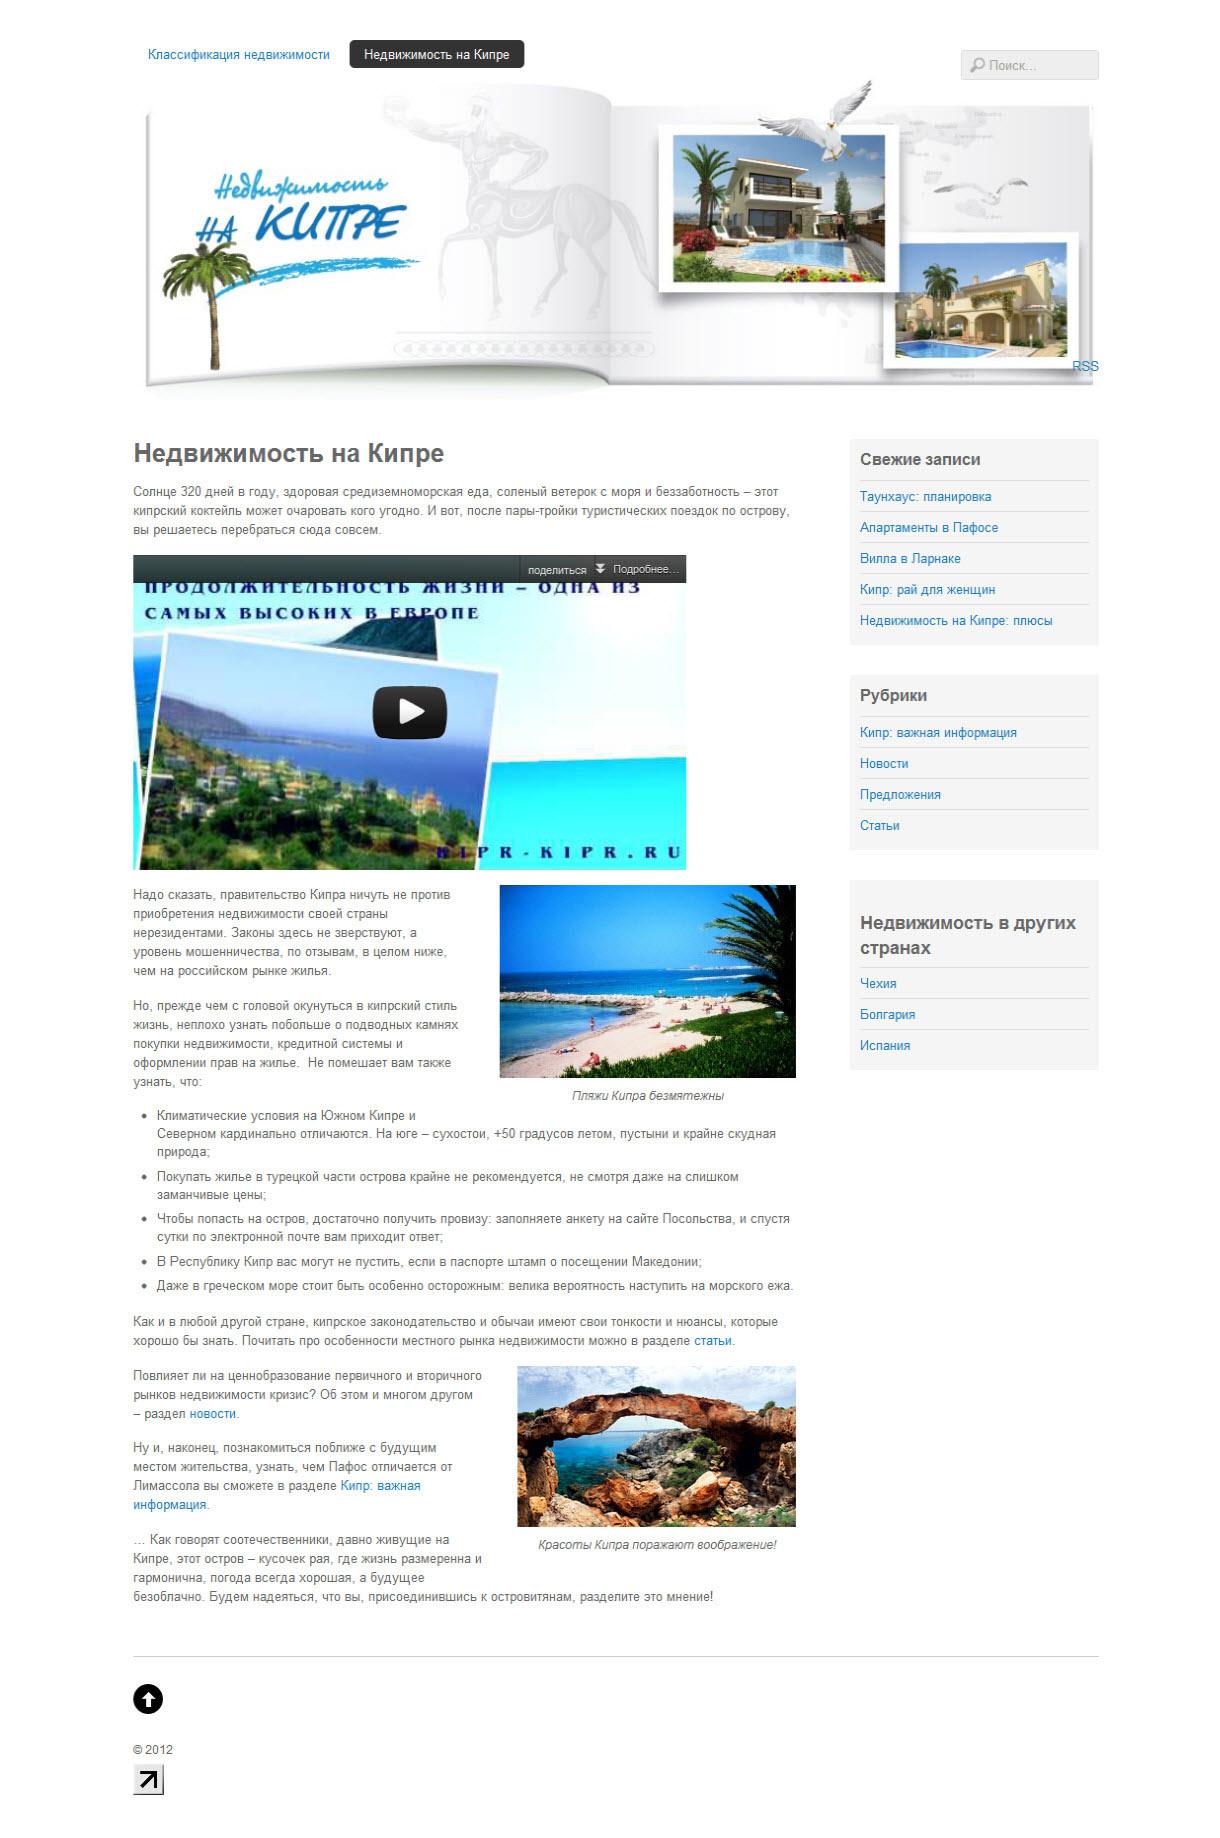 Сайты недвижимости на кипре аренда квартир в дубае jbr